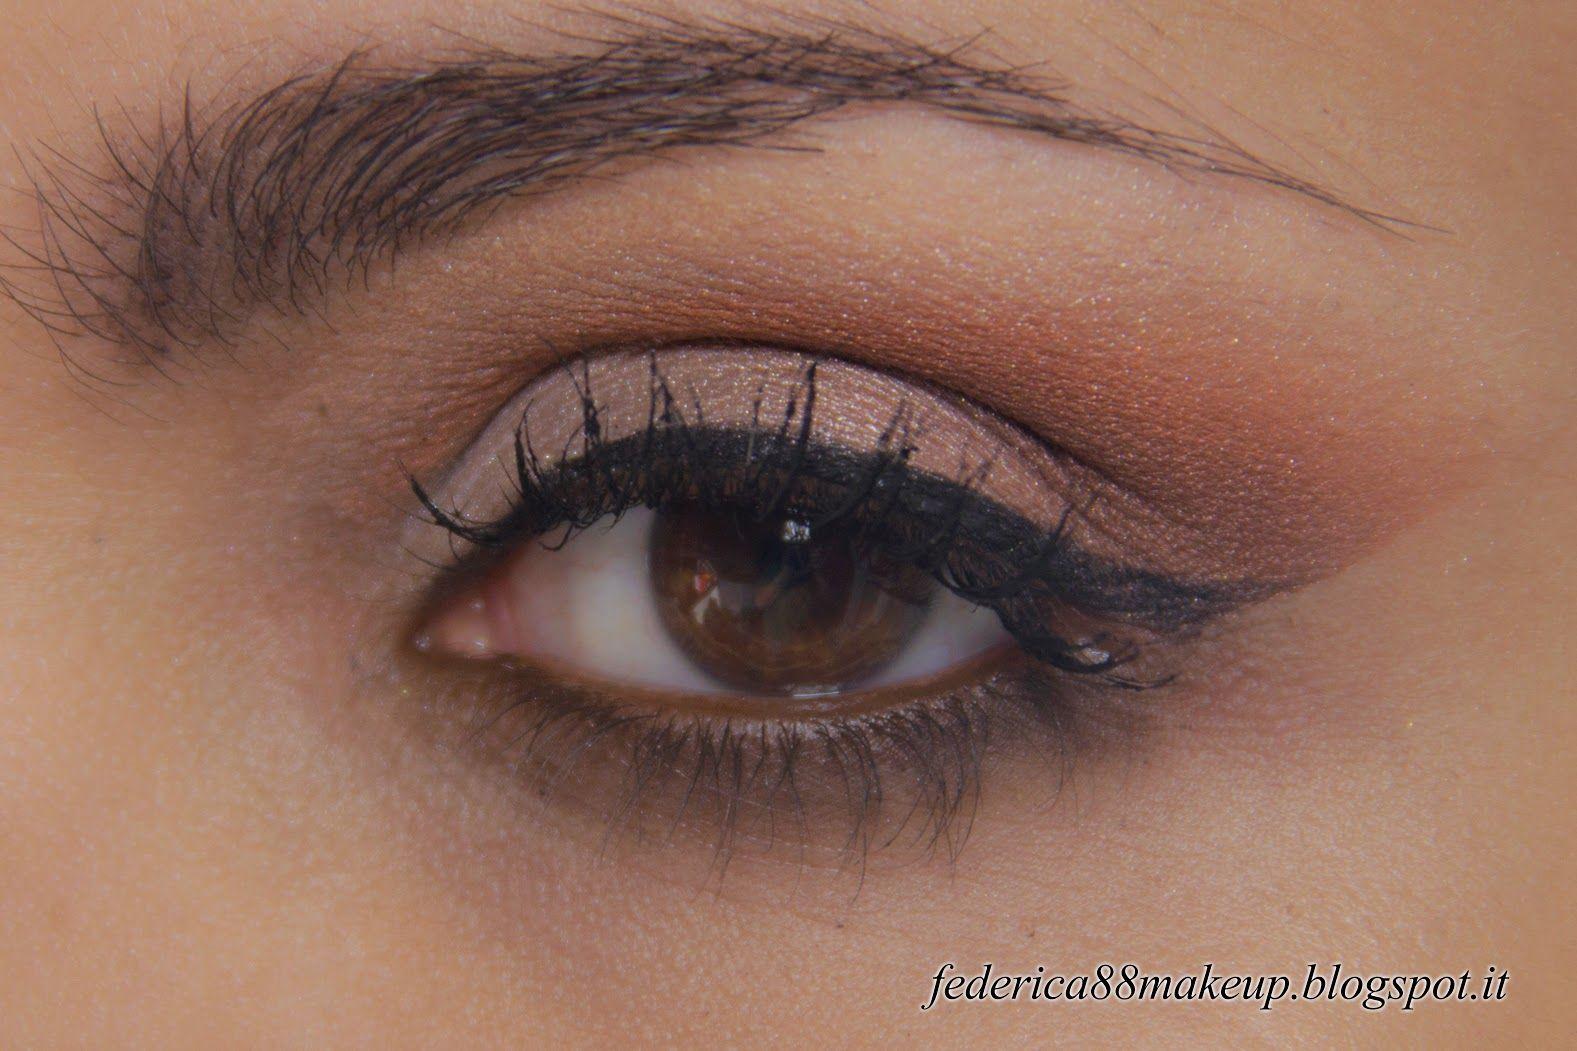 Federica88 Make Up: PaciugoPedia2 #2